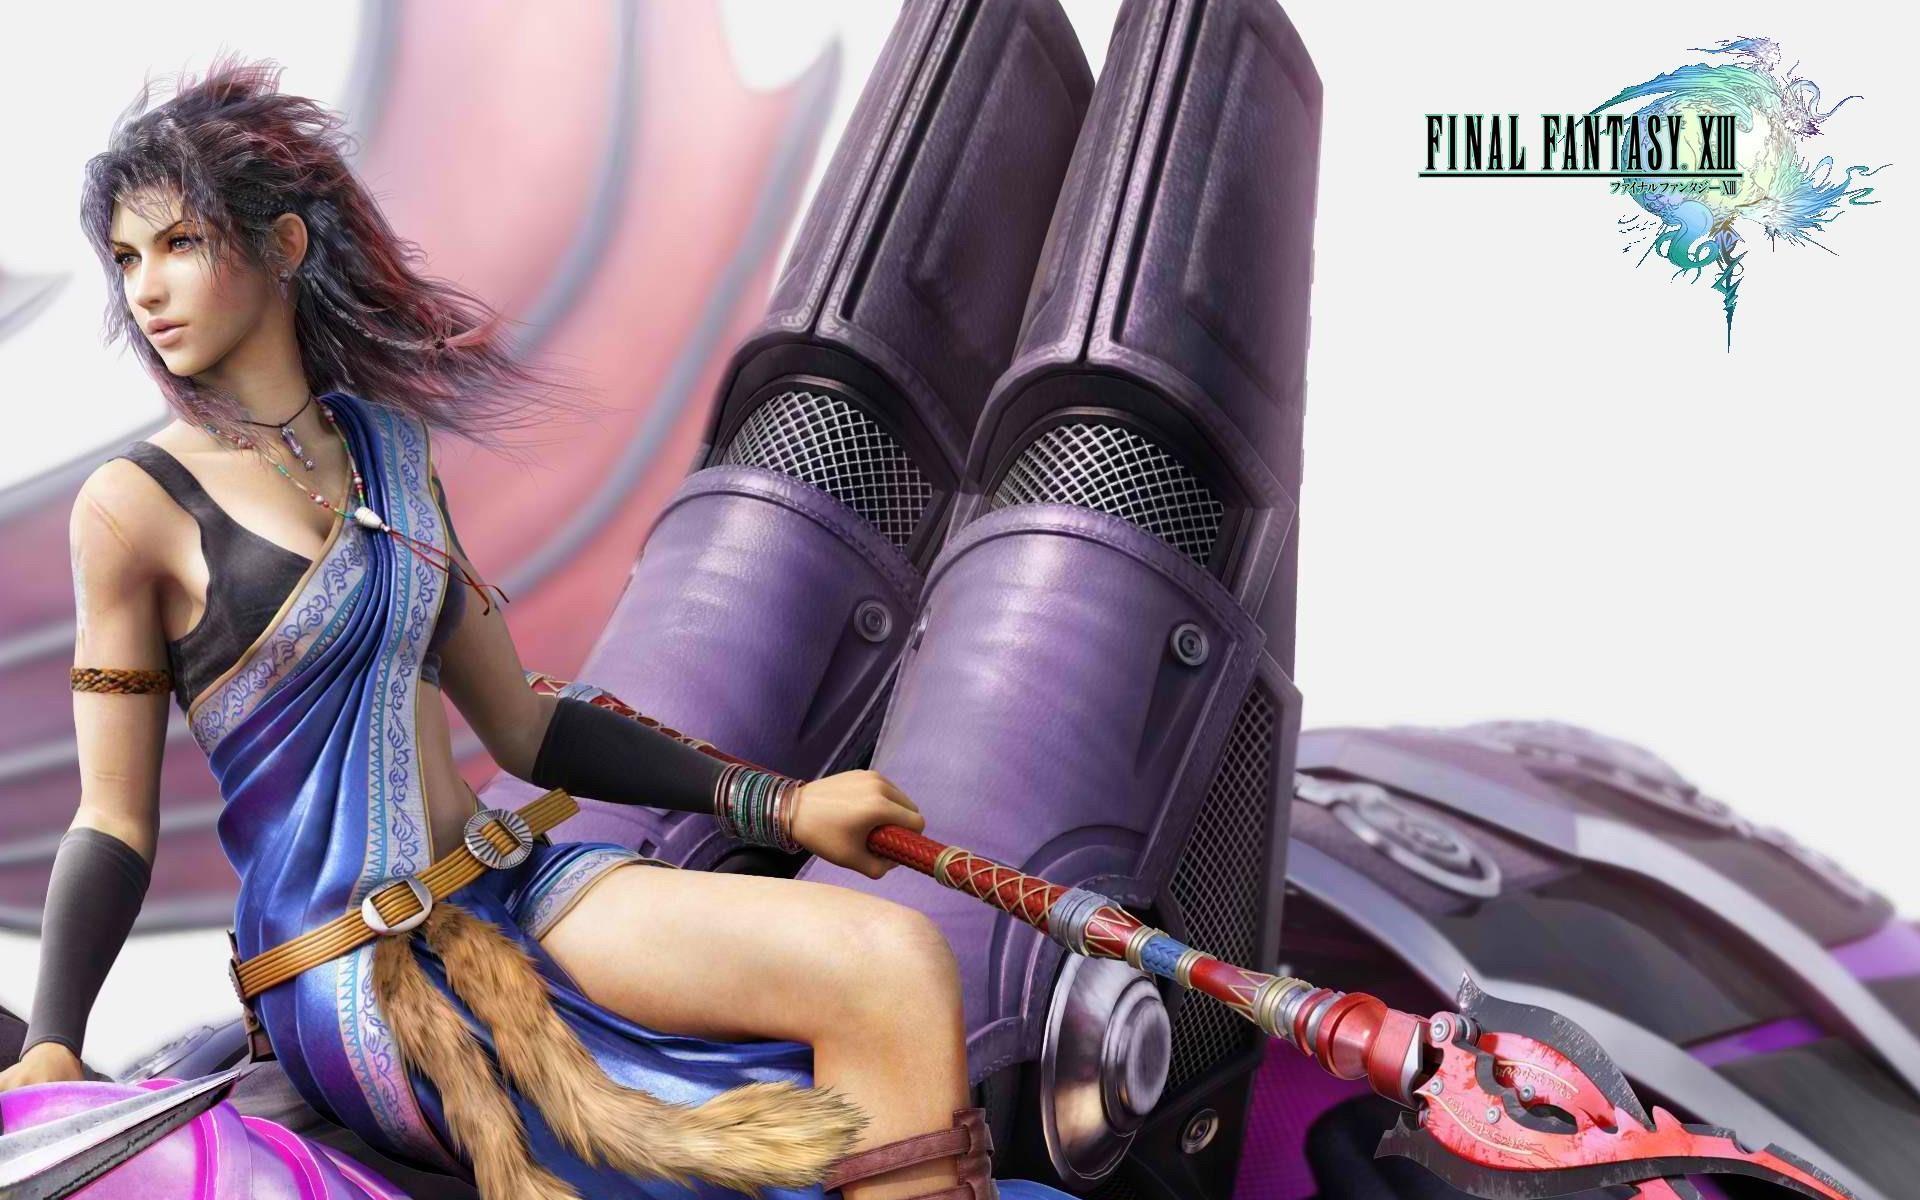 Boobs milf final fantasy nude girl pic